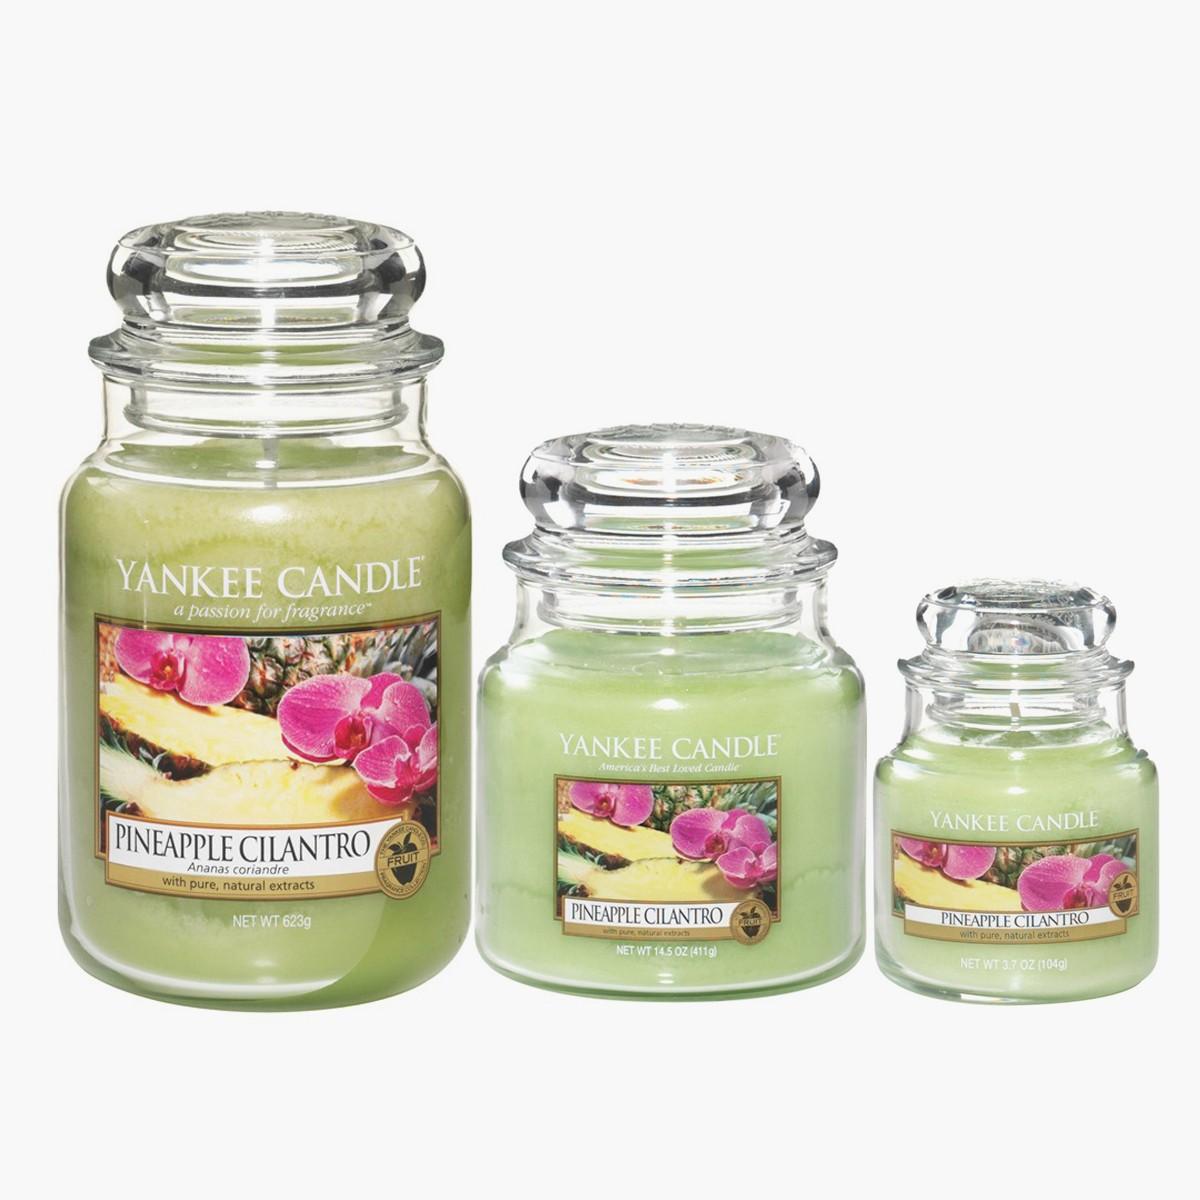 yankee candle jarre pinapple cilantro. Black Bedroom Furniture Sets. Home Design Ideas